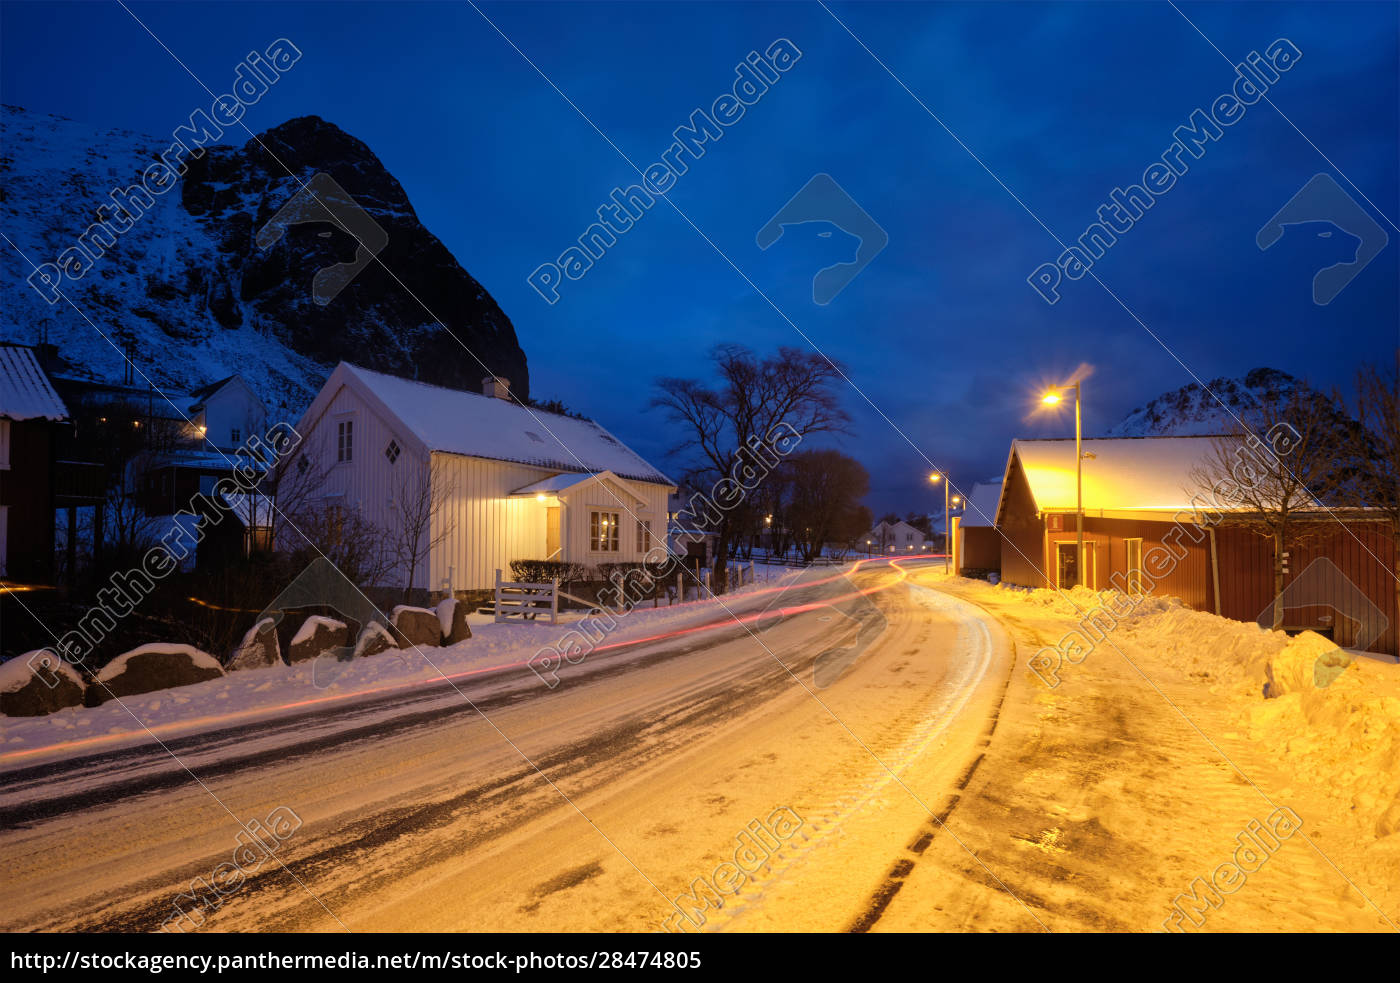 vej, i, ramberg, landsby, med, røde - 28474805